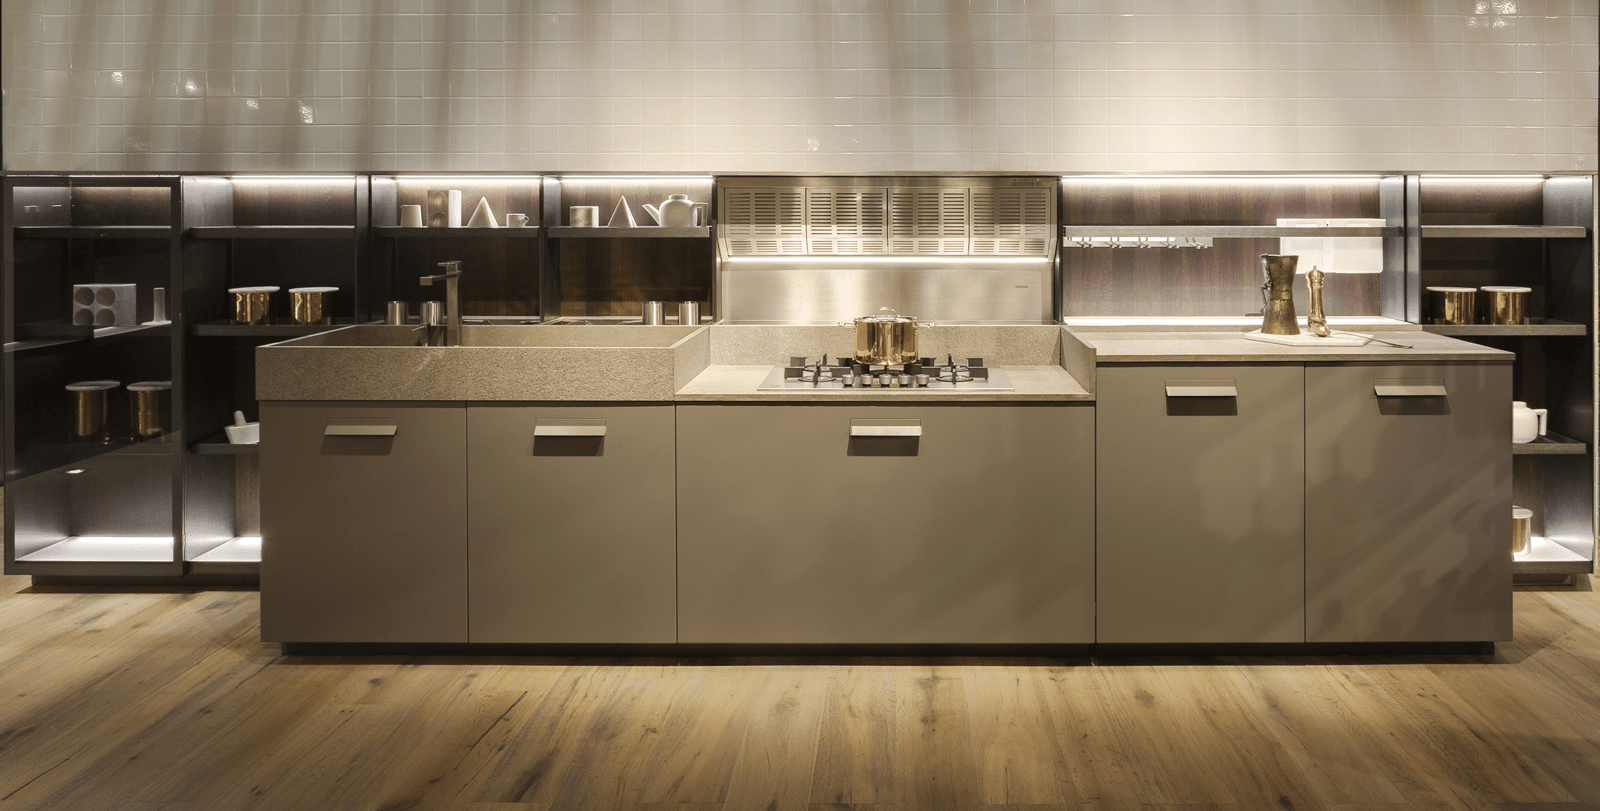 Boiserie attrezzate per le cucine - Cose di Casa